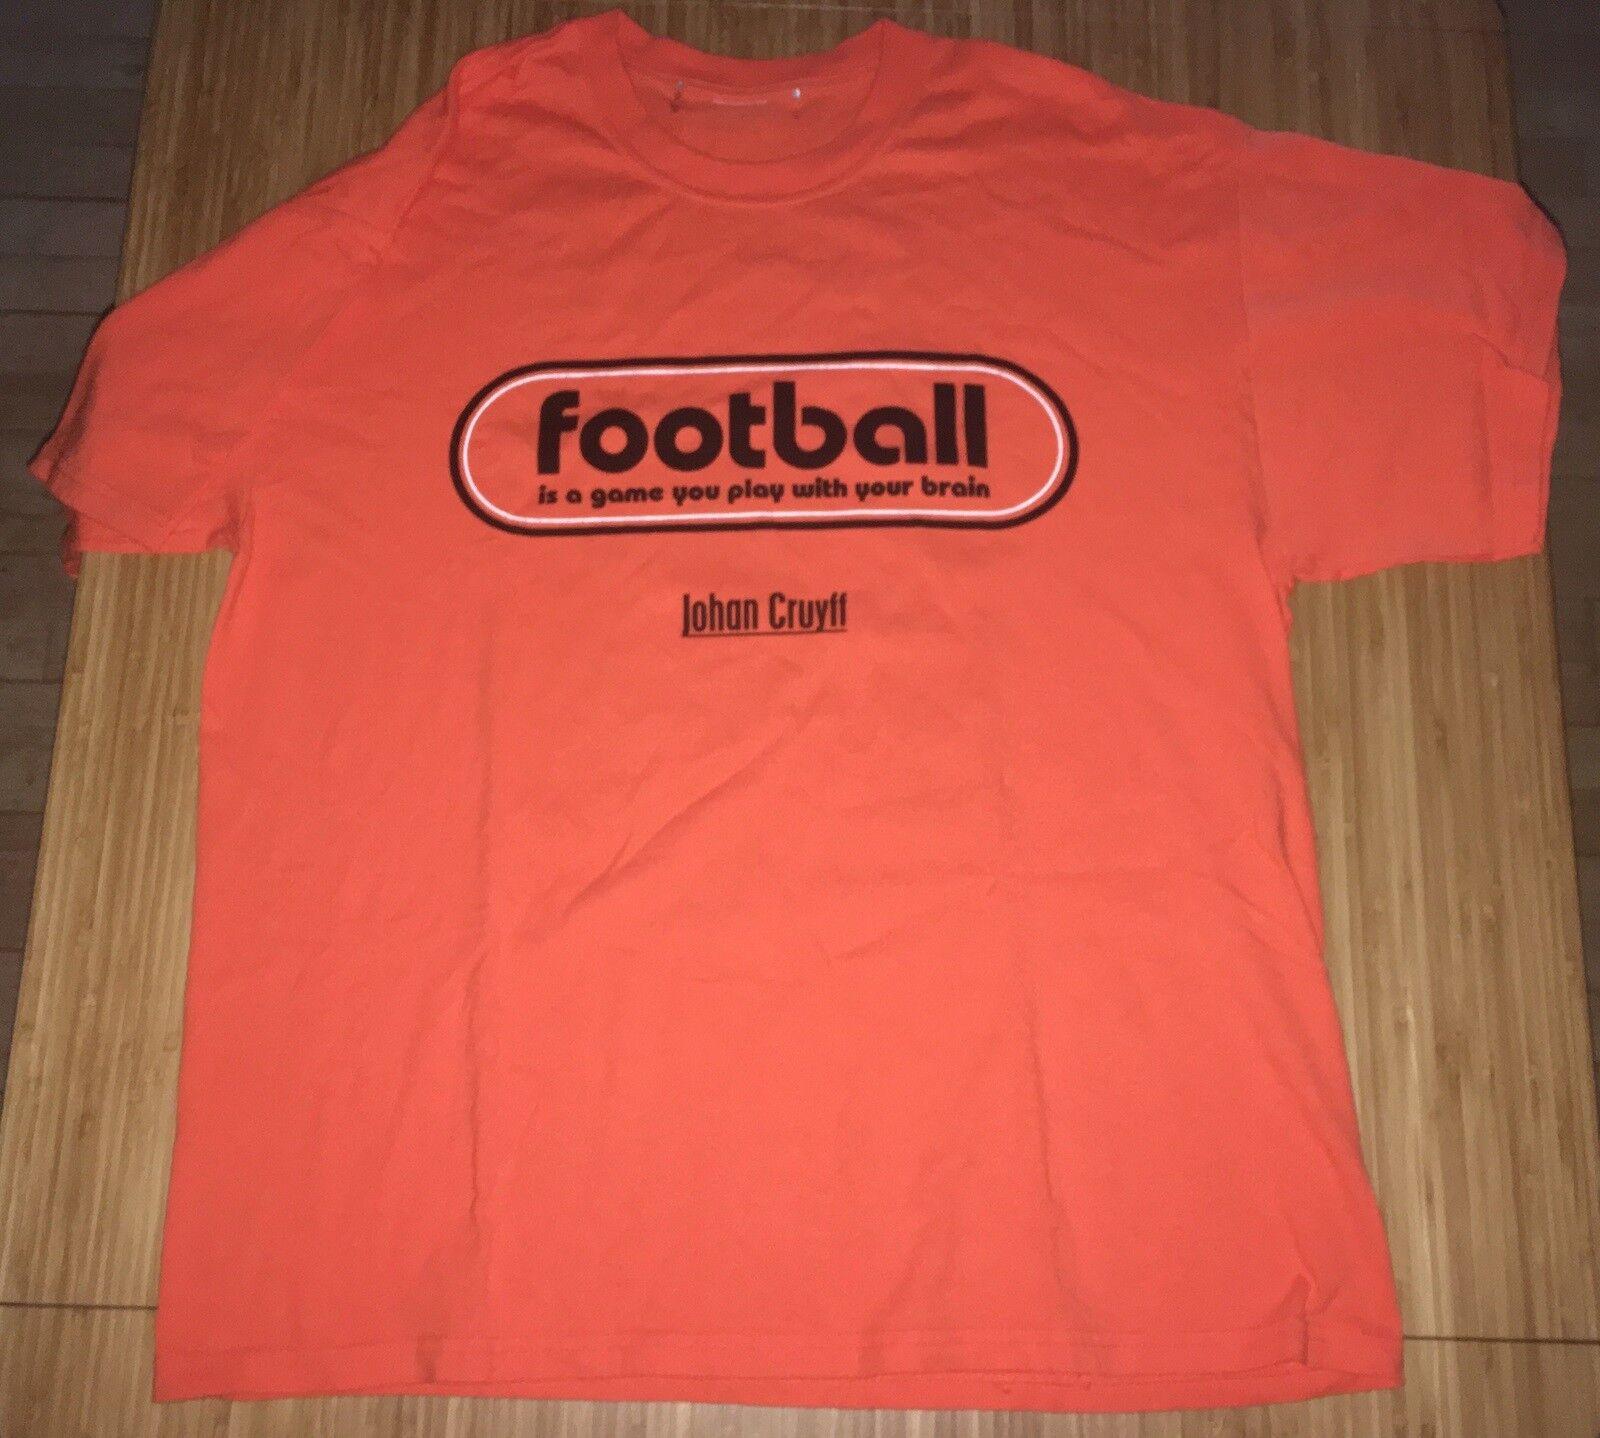 T shirt, Johan Cruyff t shirt,